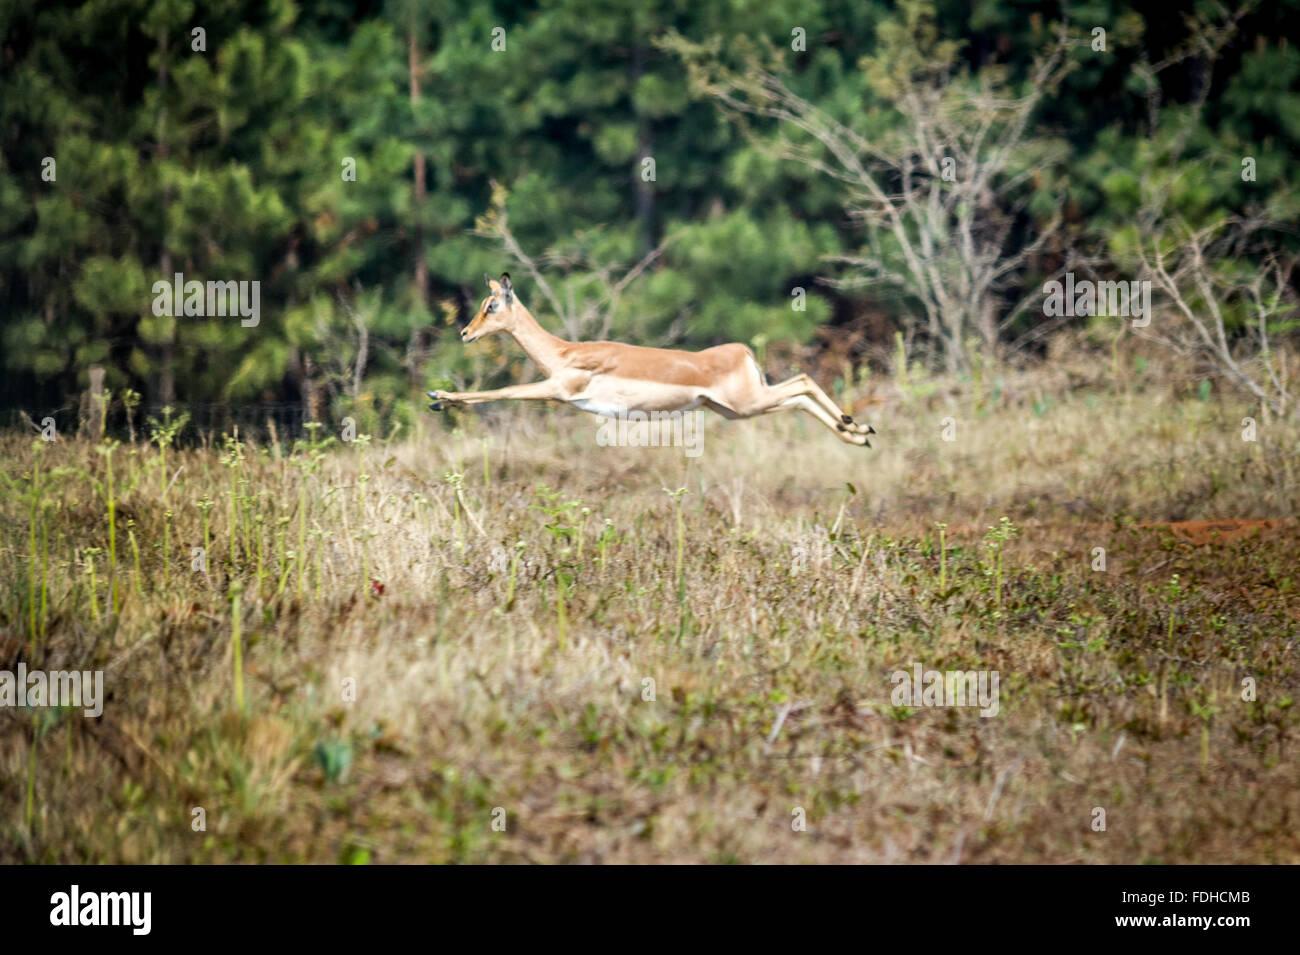 Impala (Aepyceros melampus) leaping through the air at Mlilwane Wildlife Sanctuary in Swaziland, Africa. - Stock Image